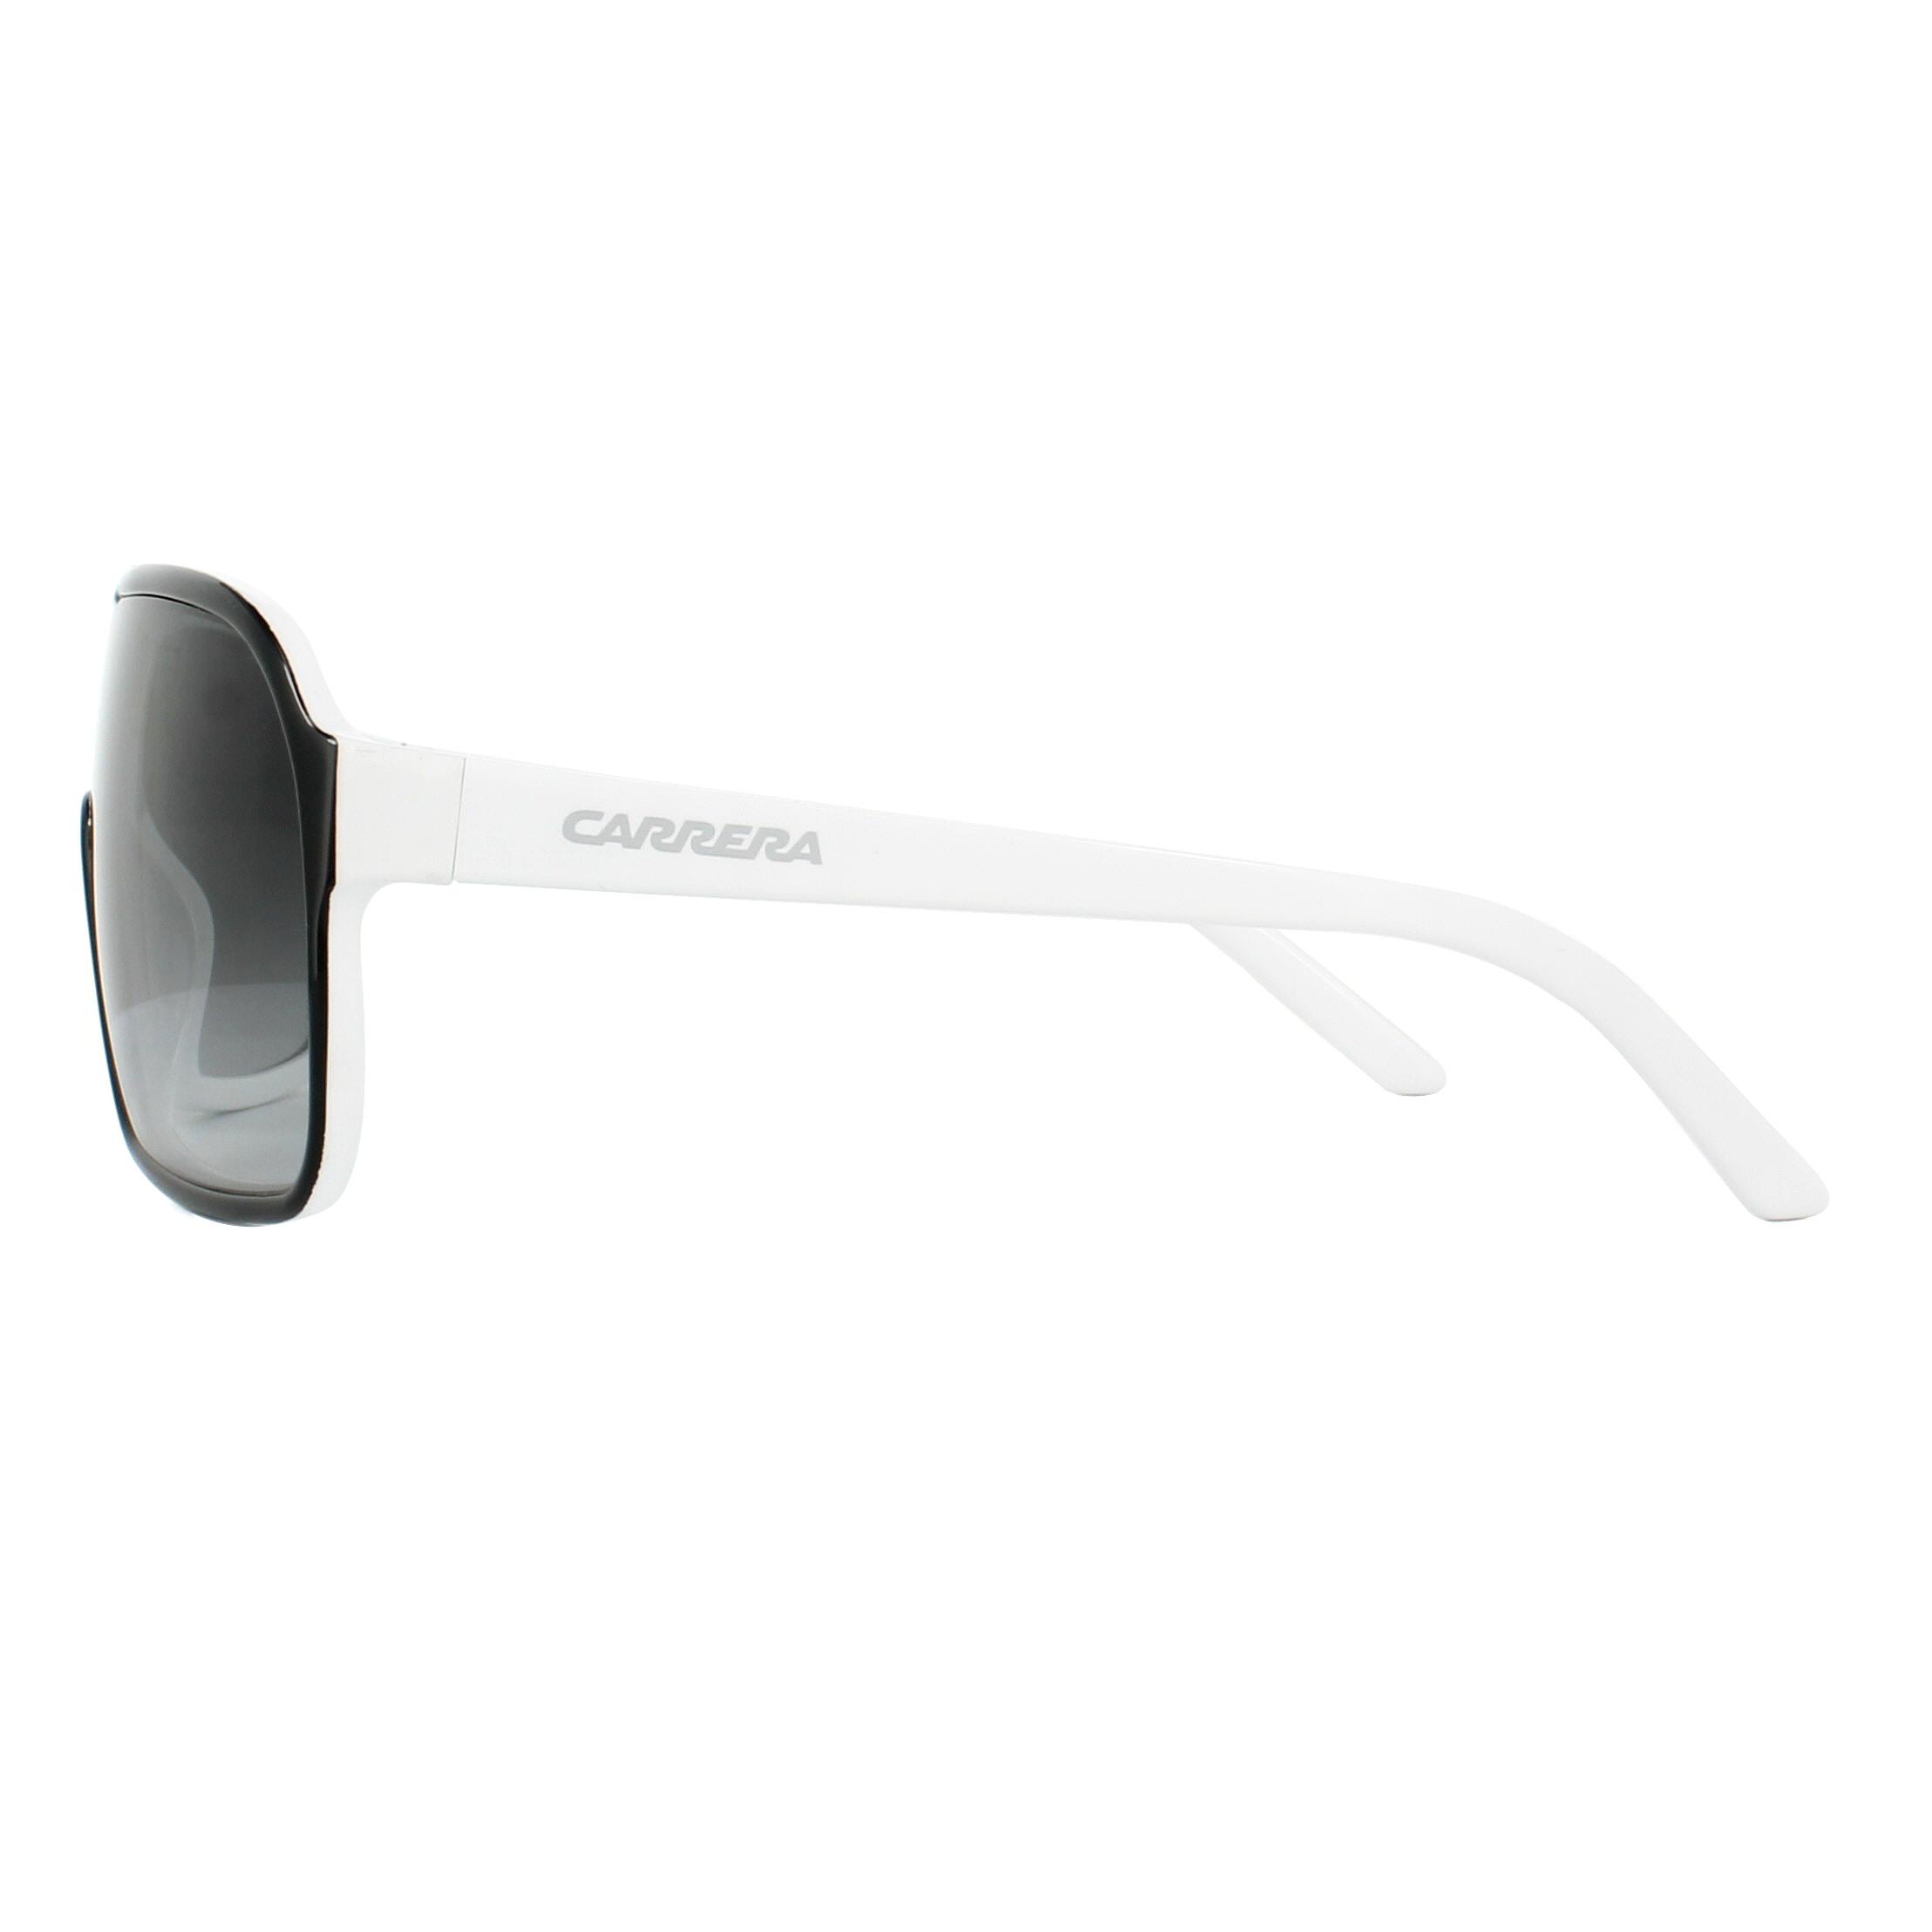 42e4a84fb5 Cheap Carrera 5530 S Sunglasses - Discounted Sunglasses